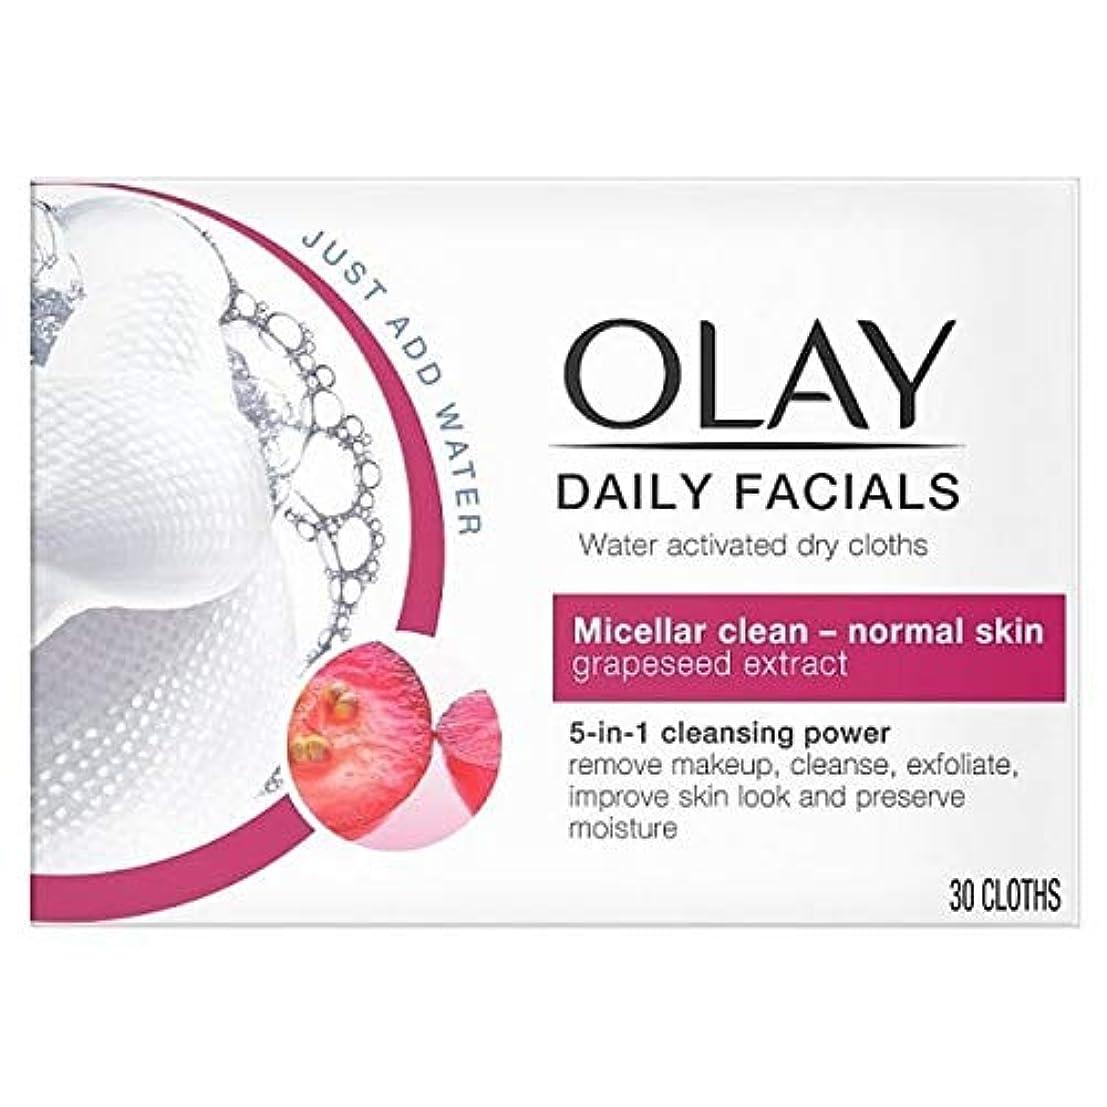 [Olay ] オーレイ毎日フェイシャル5-In1は乾燥布 - 正常な皮膚 - Olay Daily Facials 5-in1 Dry Cloths - Normal Skin [並行輸入品]